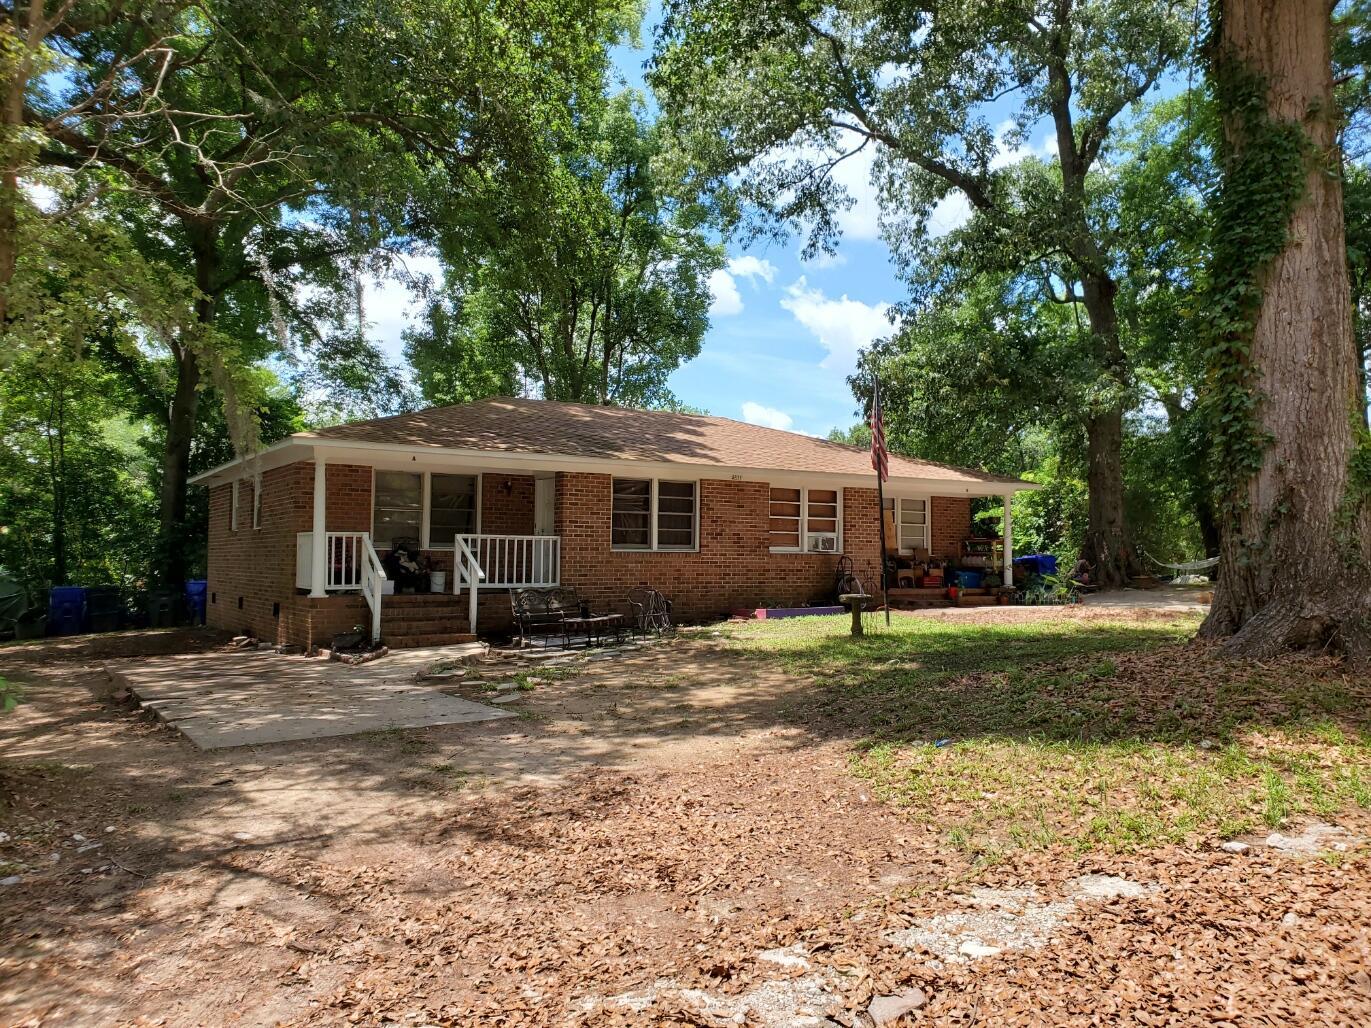 4851 Hickman Street, North Charleston, 29405, ,For Sale,Hickman,21016082